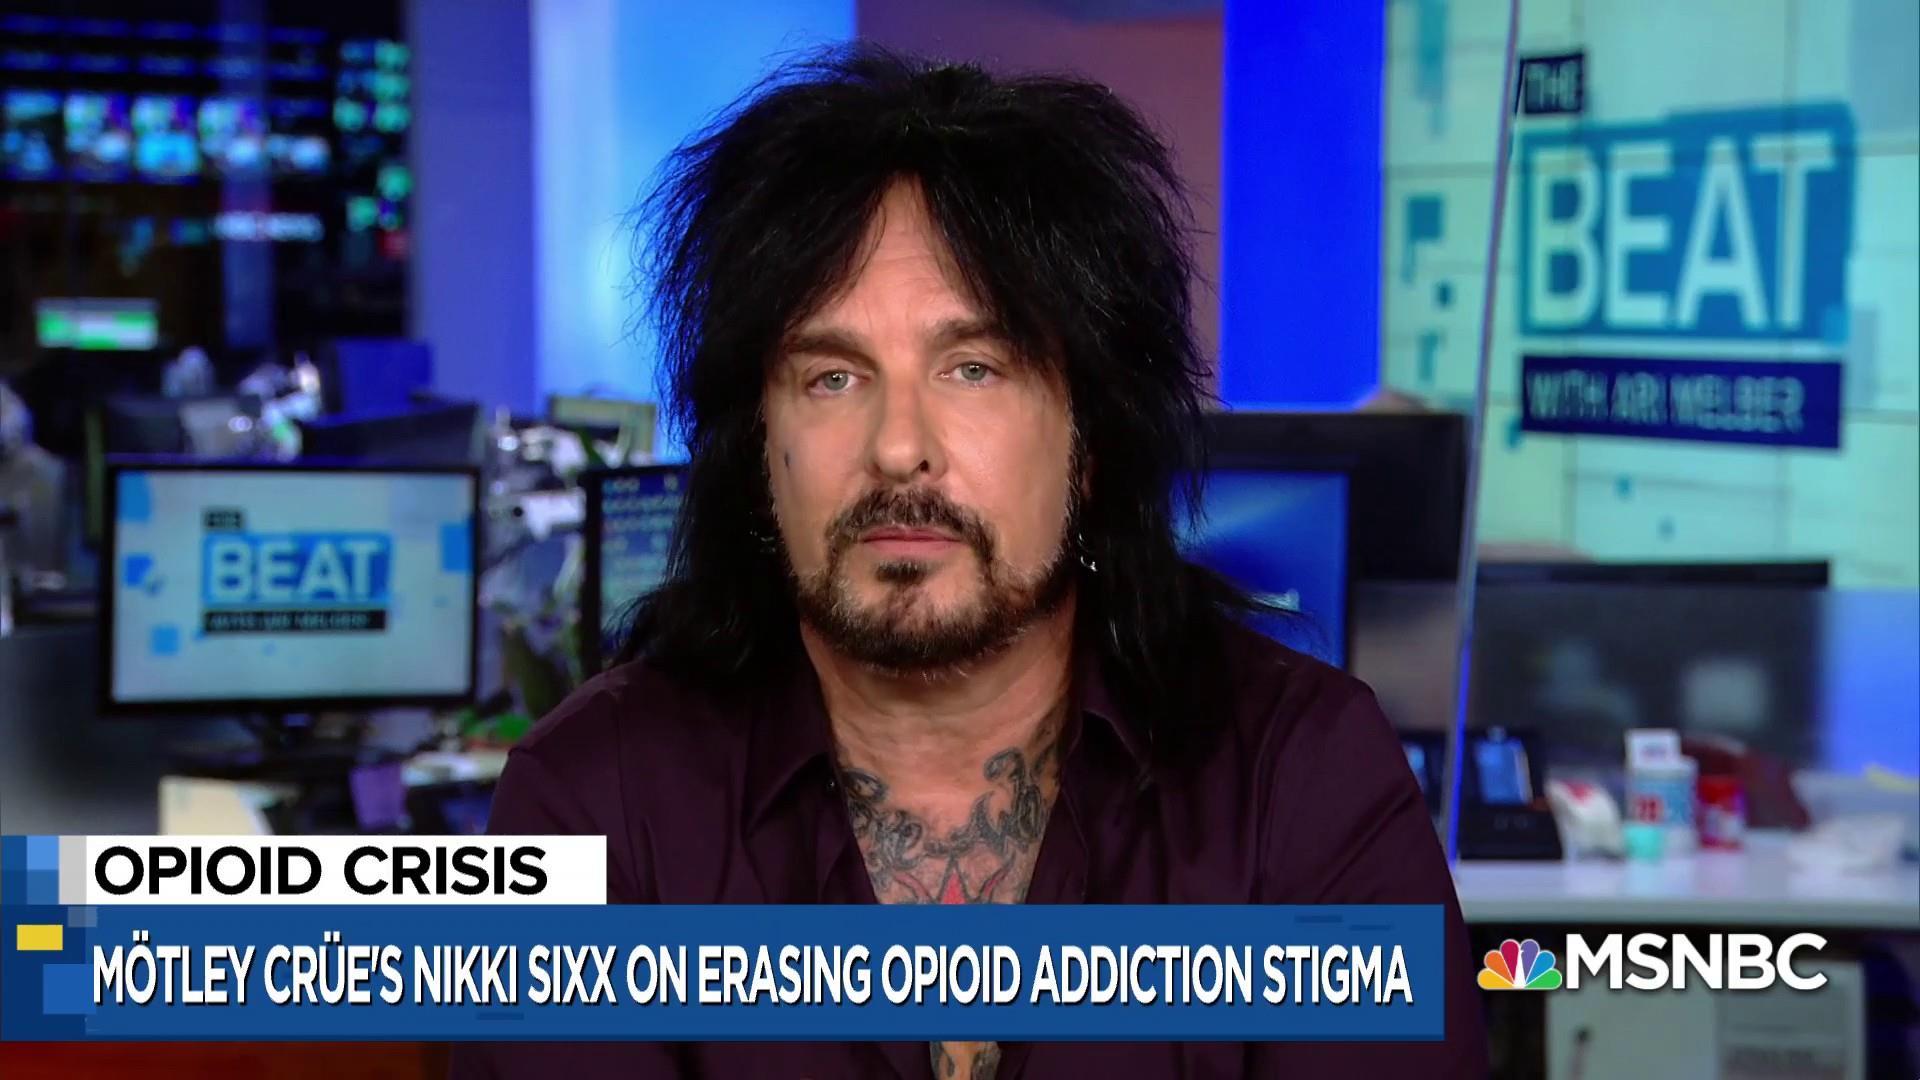 Nikki Sixx: we must work to end stigma of opioid addiction